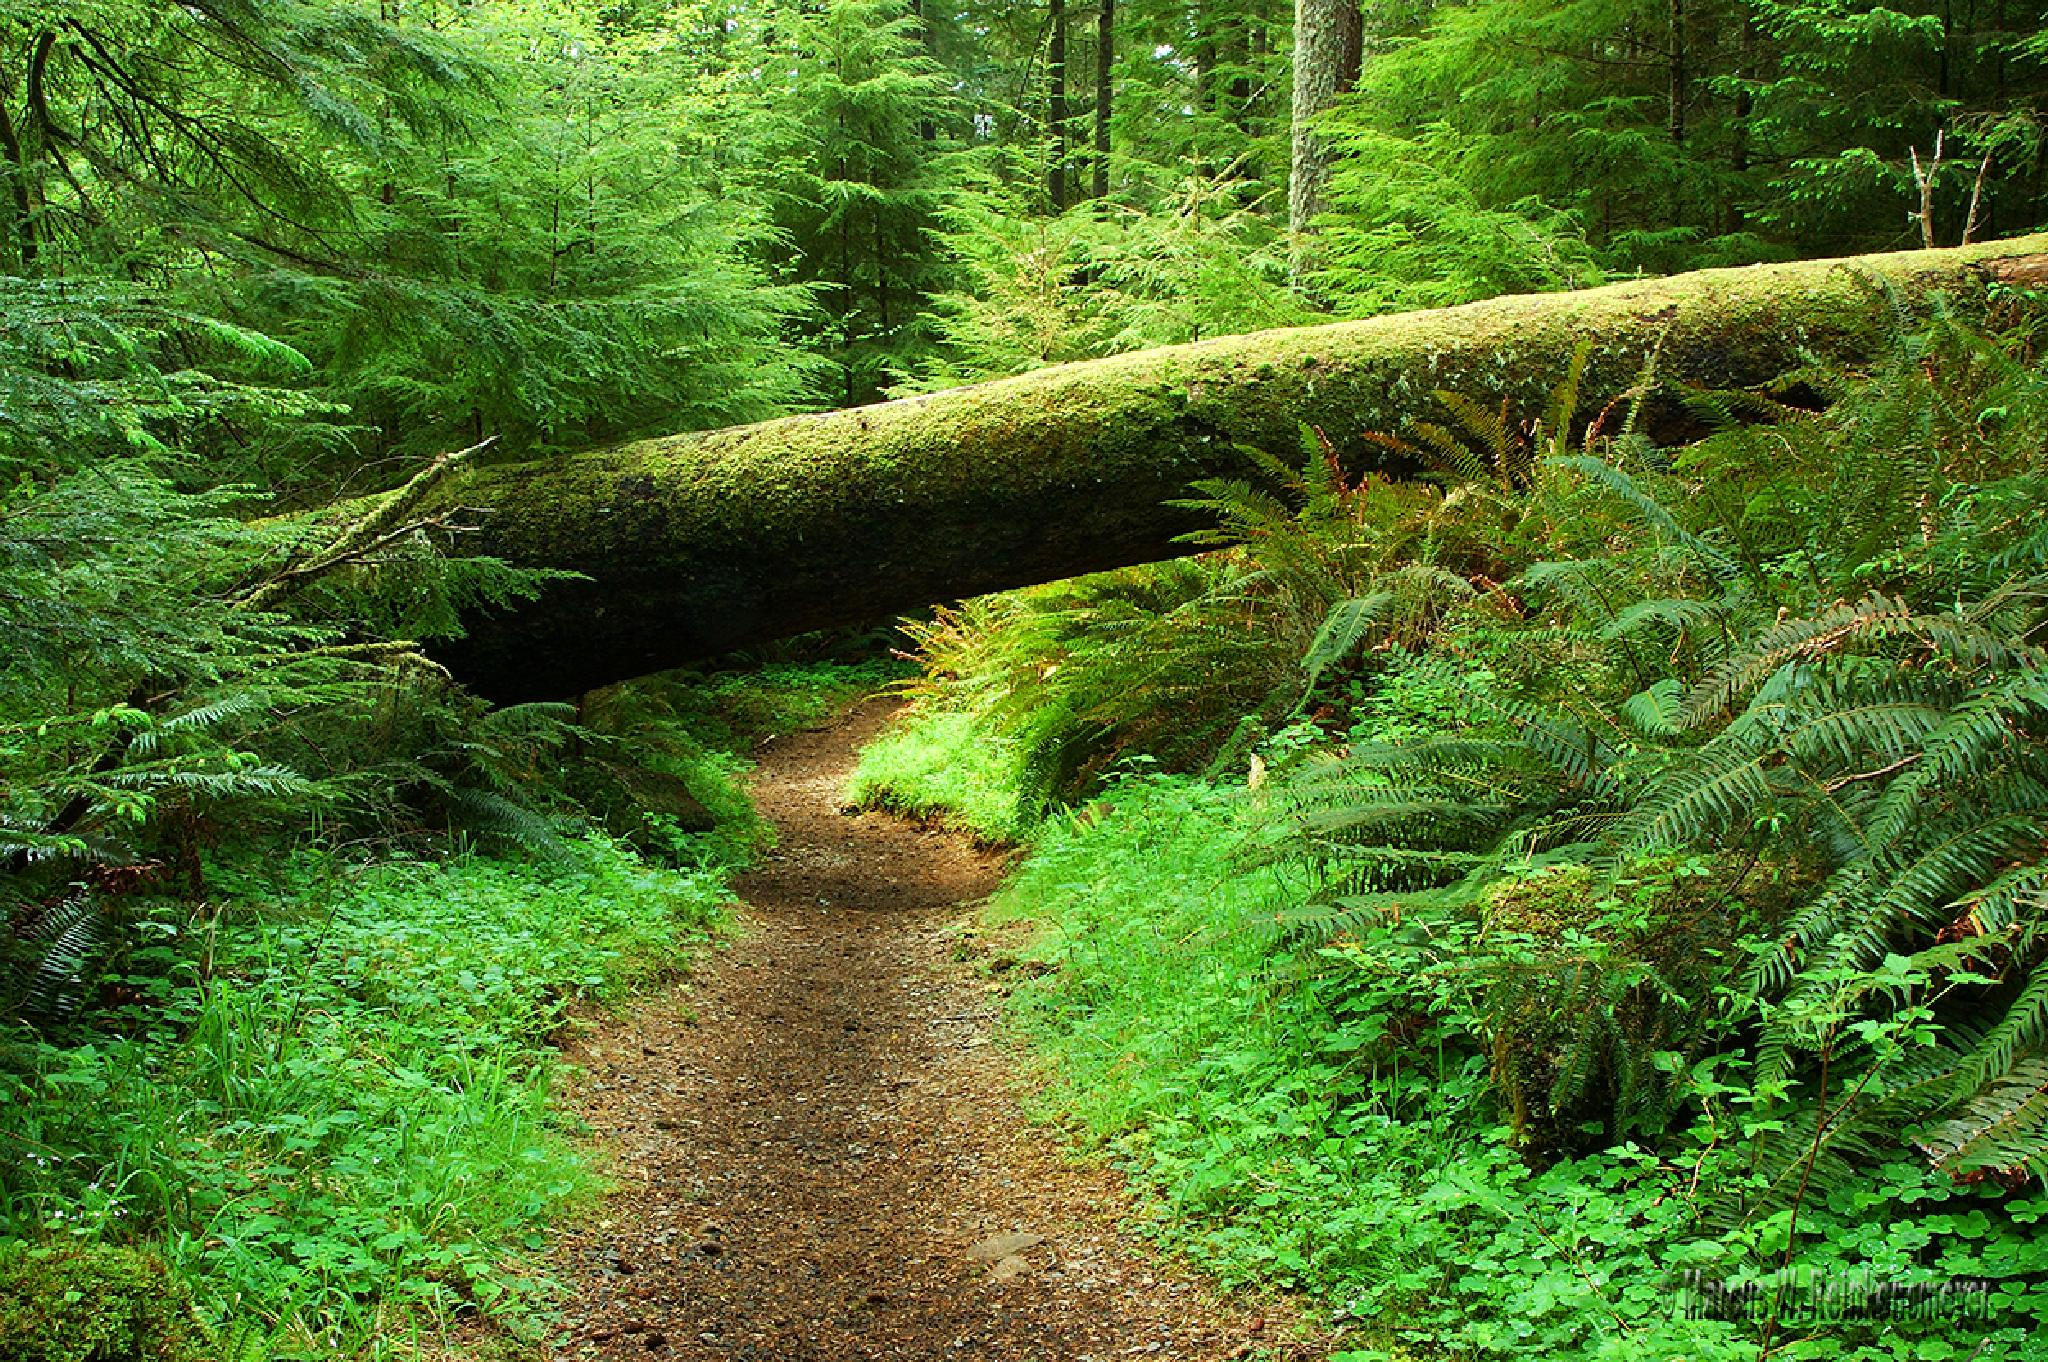 Less Traveled Path by reinkensmeyer